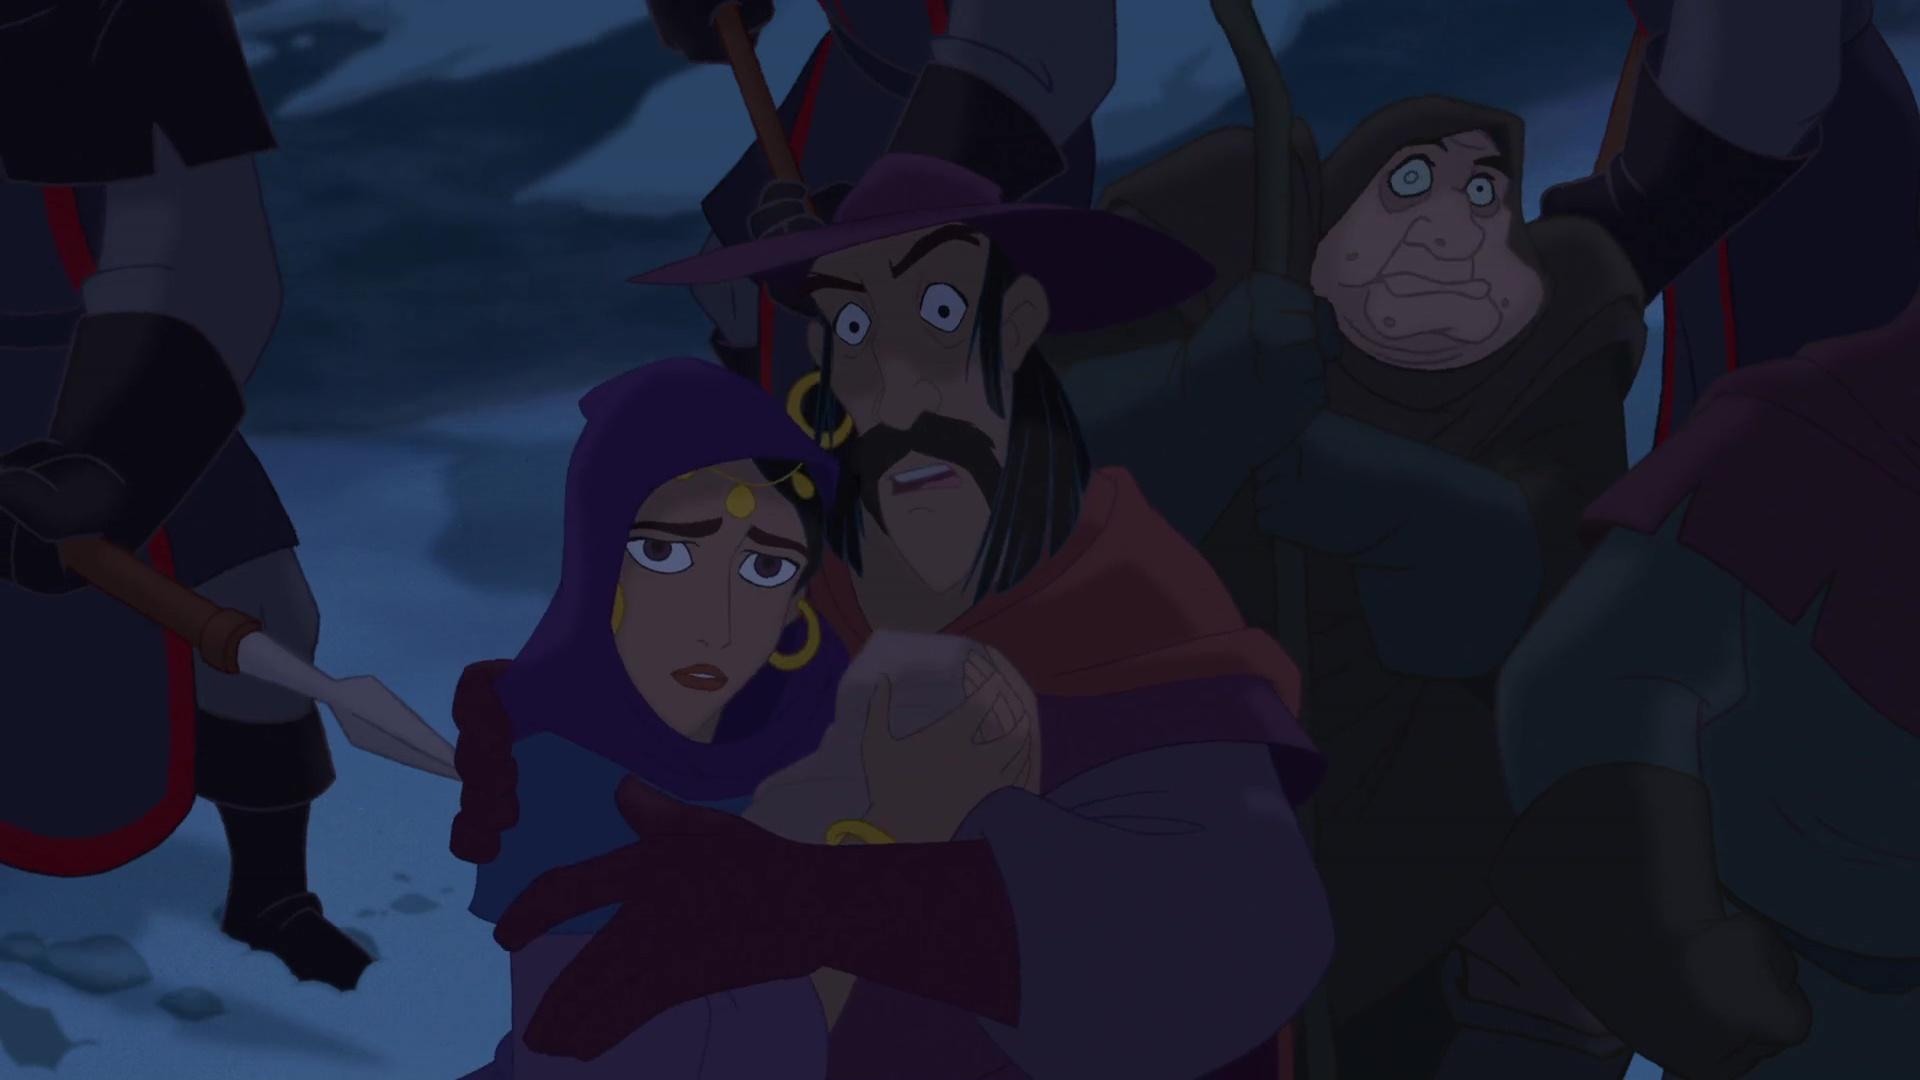 parents quasimodo personnage bossu notre-dame disney character hunchback